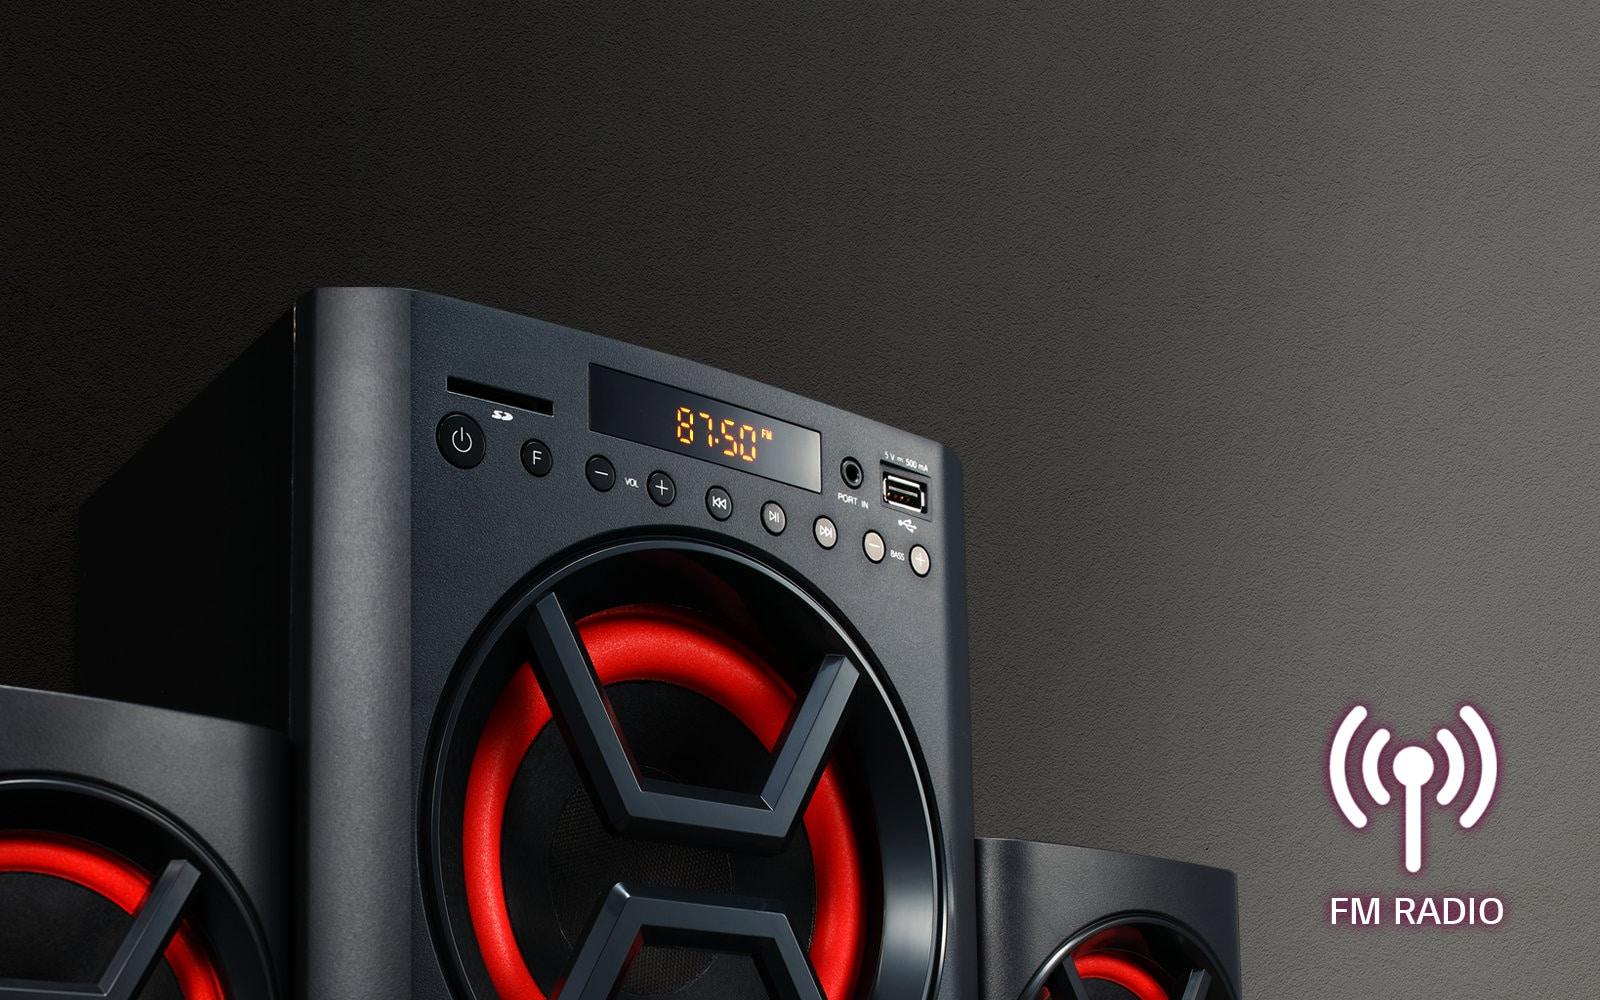 FM Radio Playback<br>1